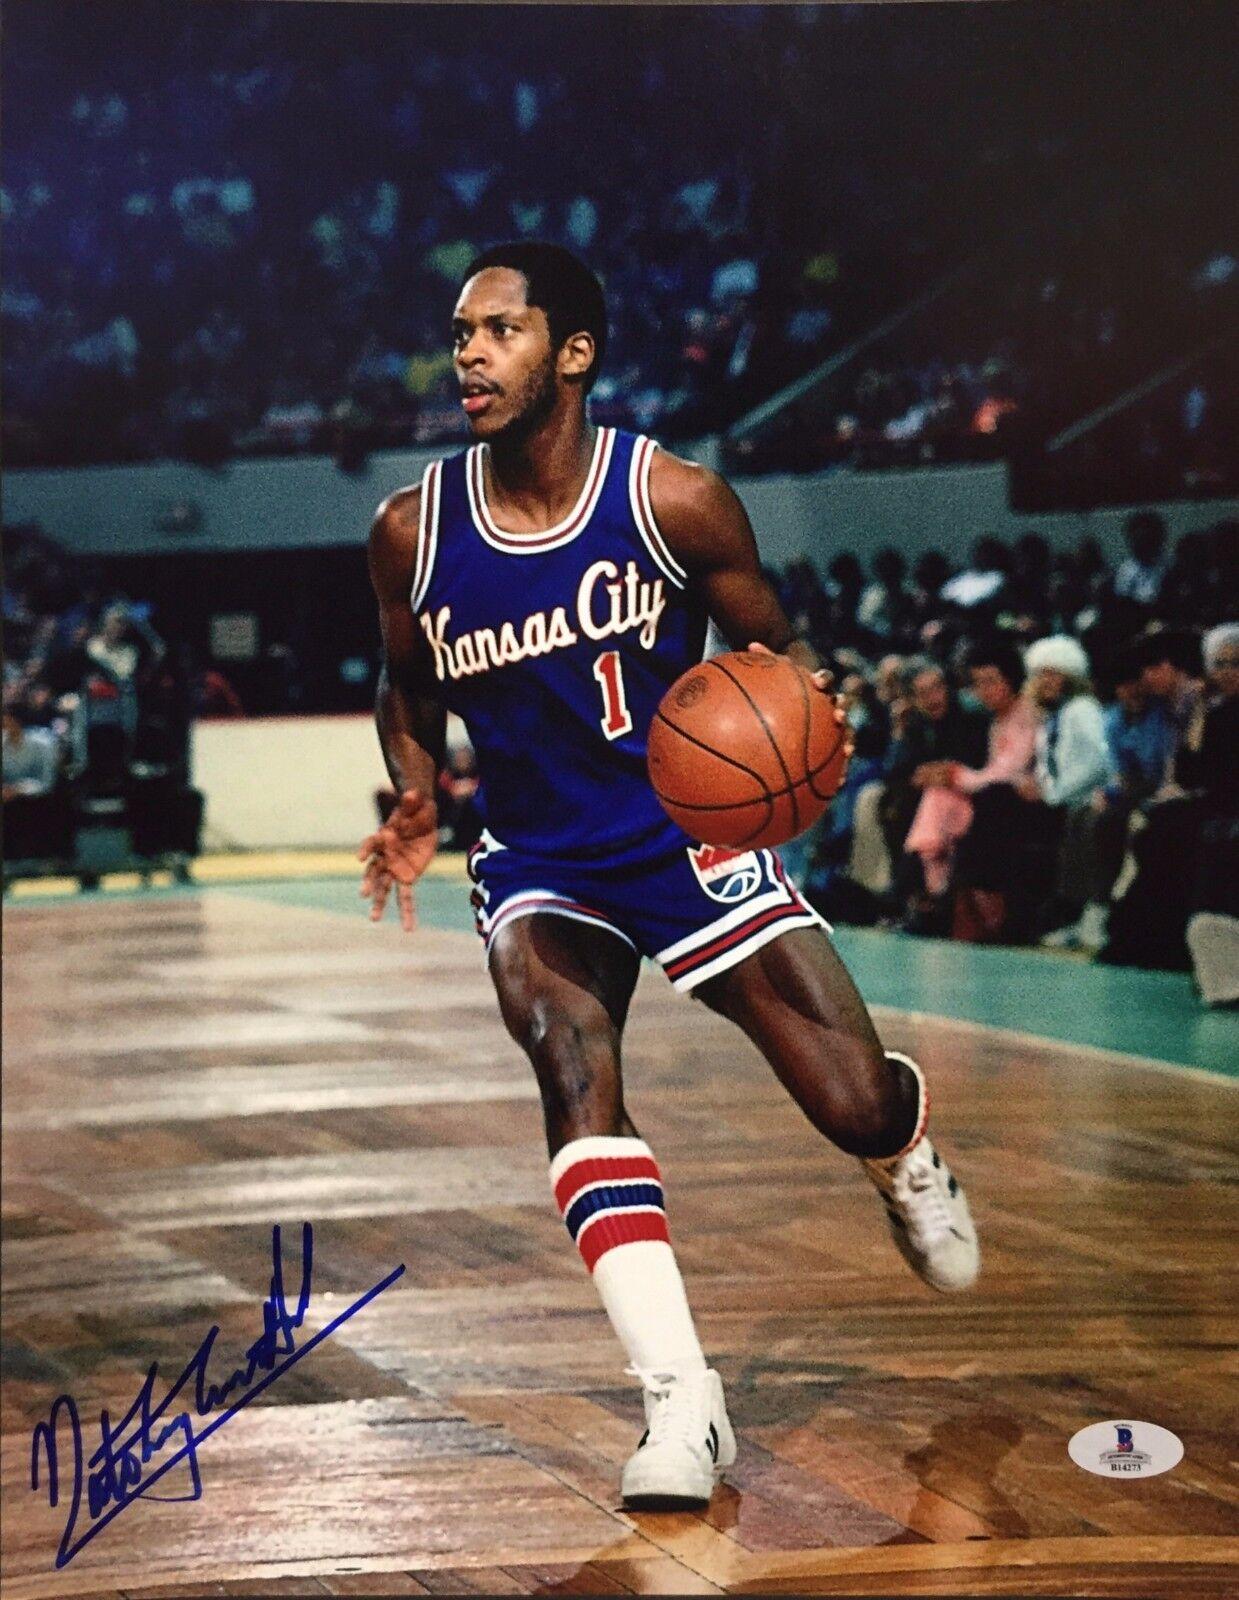 Nate 'Tiny' Thurmond Signed Kansas City 11x14 Basketball Photo Beckett B14273